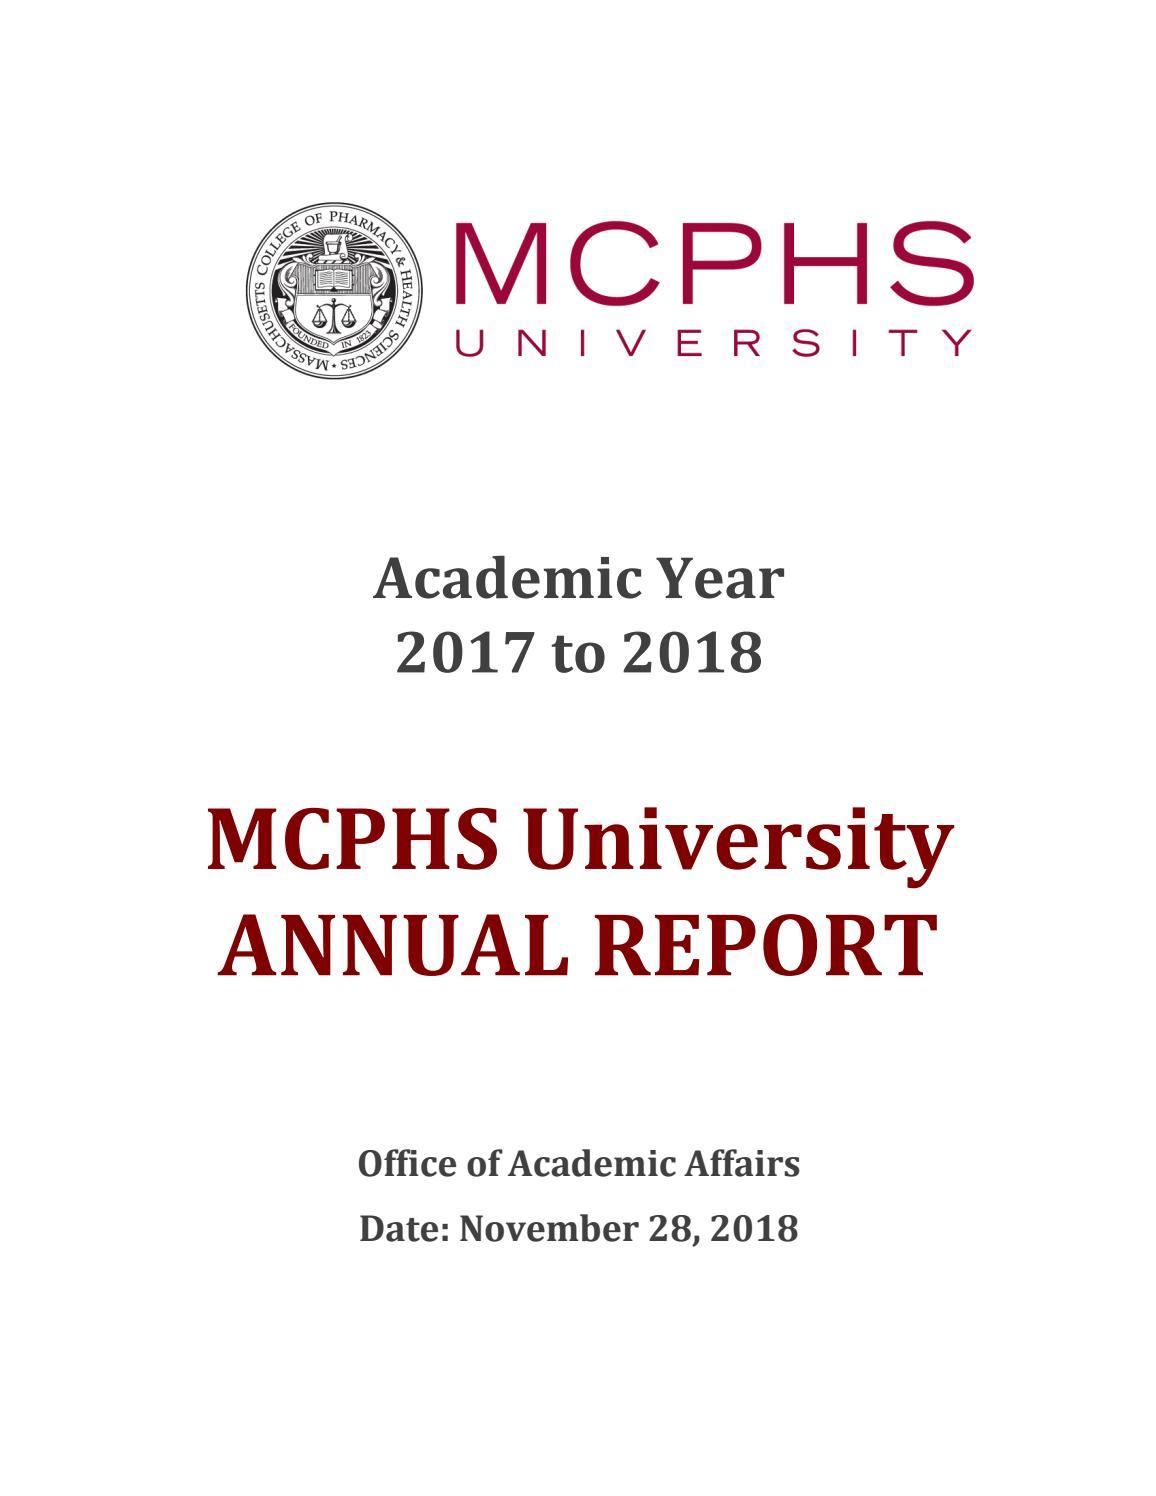 Mcphs University Annual Reportmassachusetts College Of Inside The University Of Phoenix Inc Calendar 2021/2020